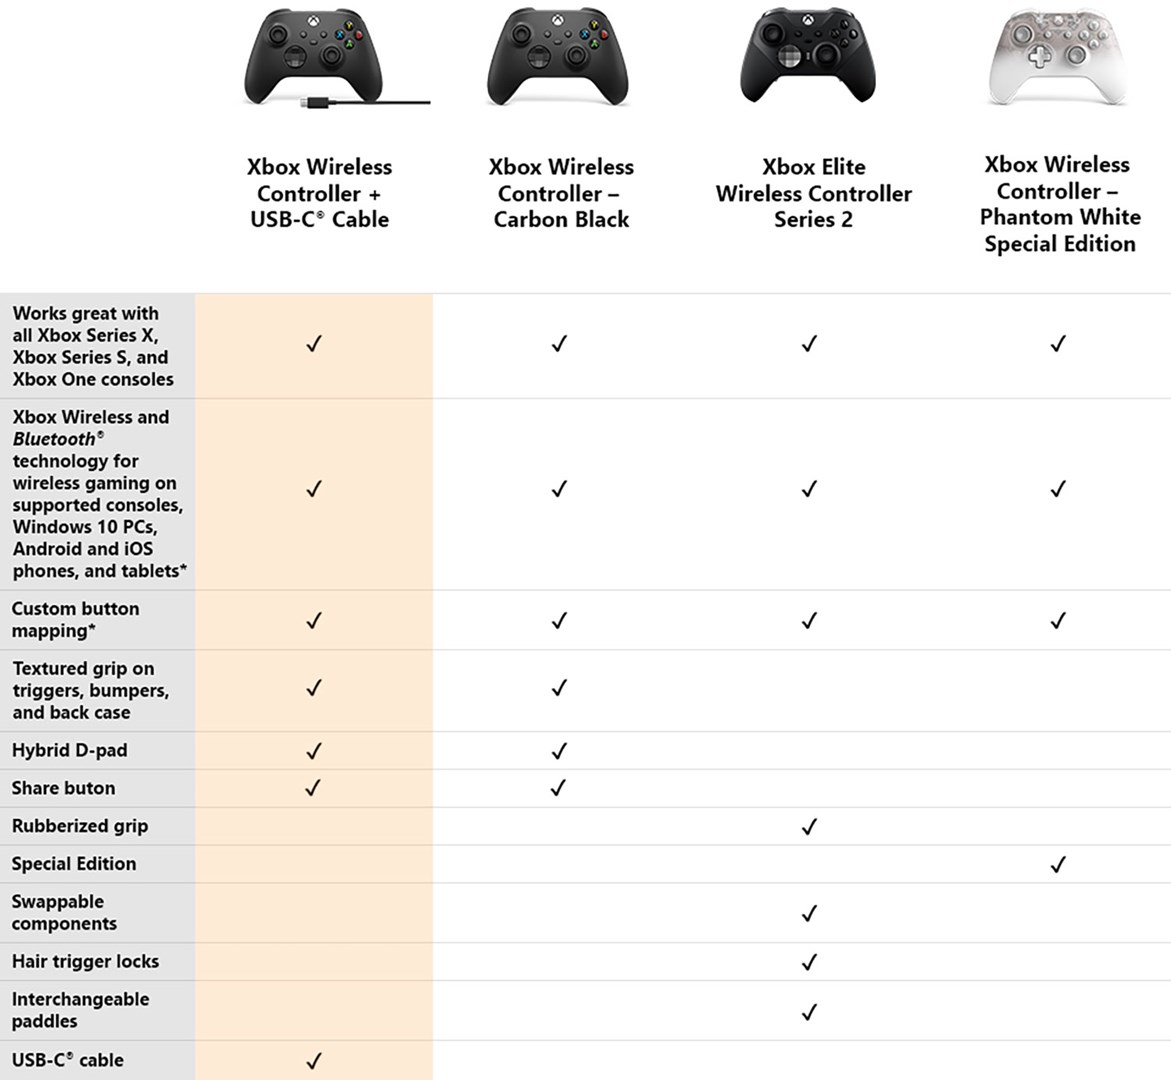 Xbox Wireless Controller USB-C